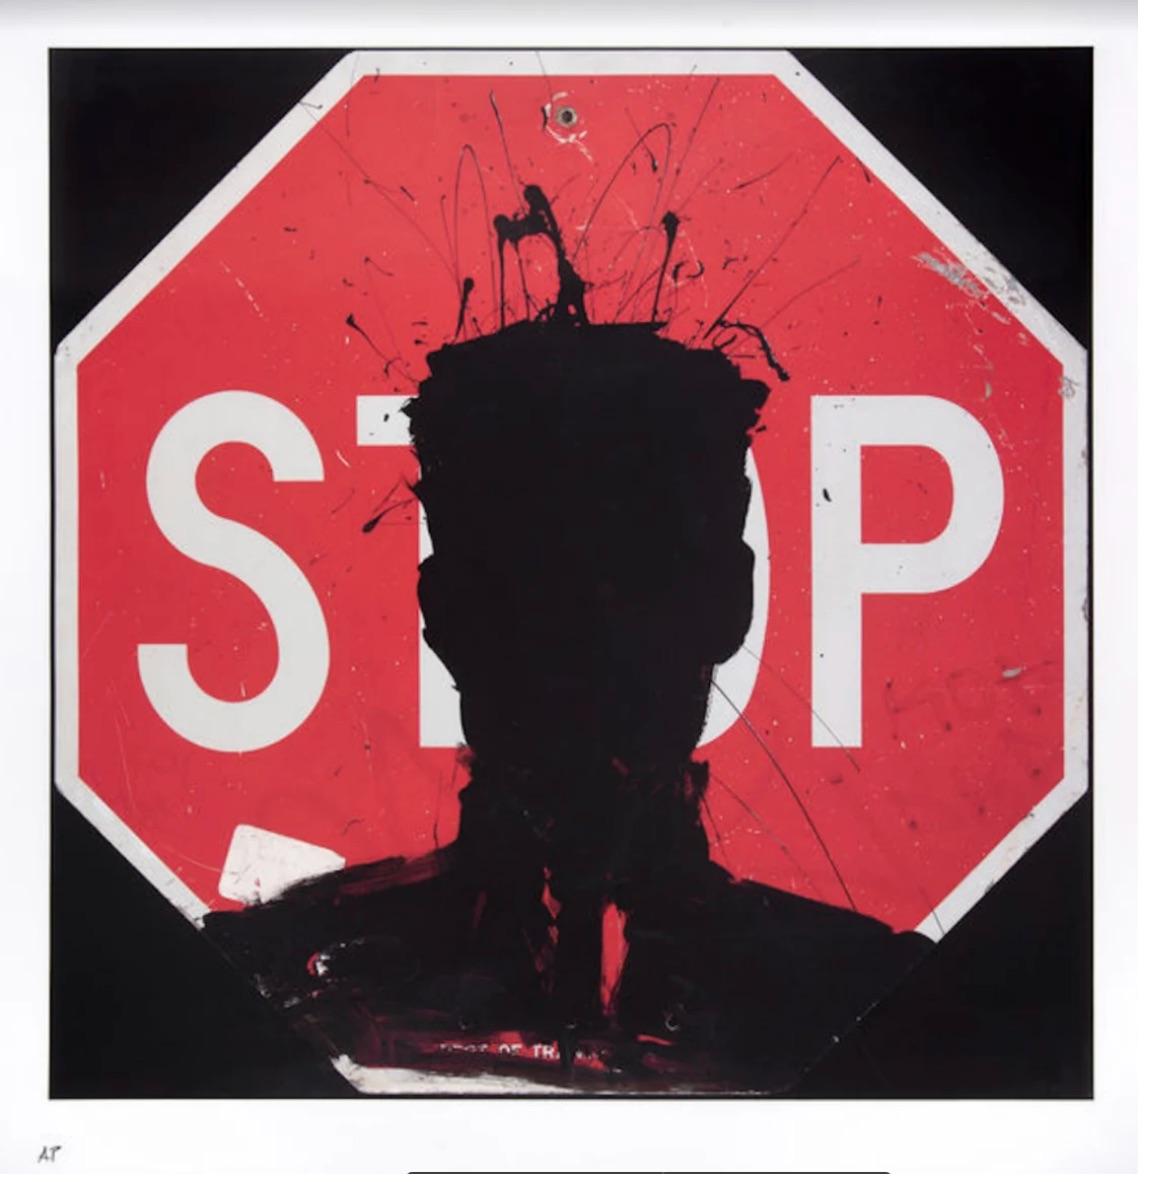 Stop Sign, 2018 by Richard Hambleton